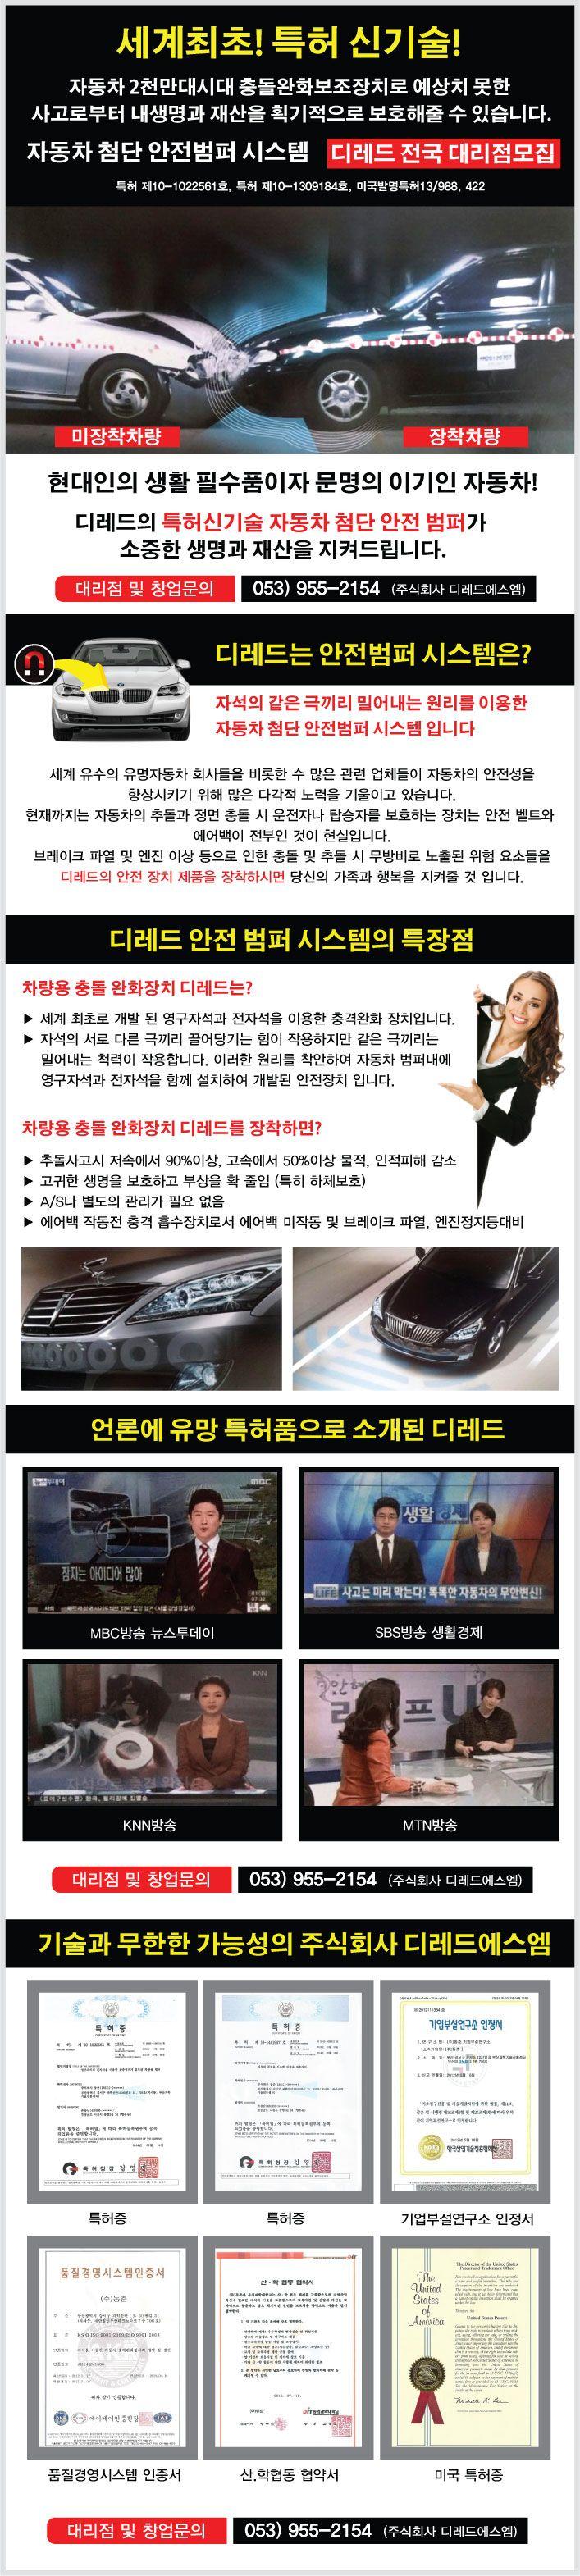 Naver Image Popup